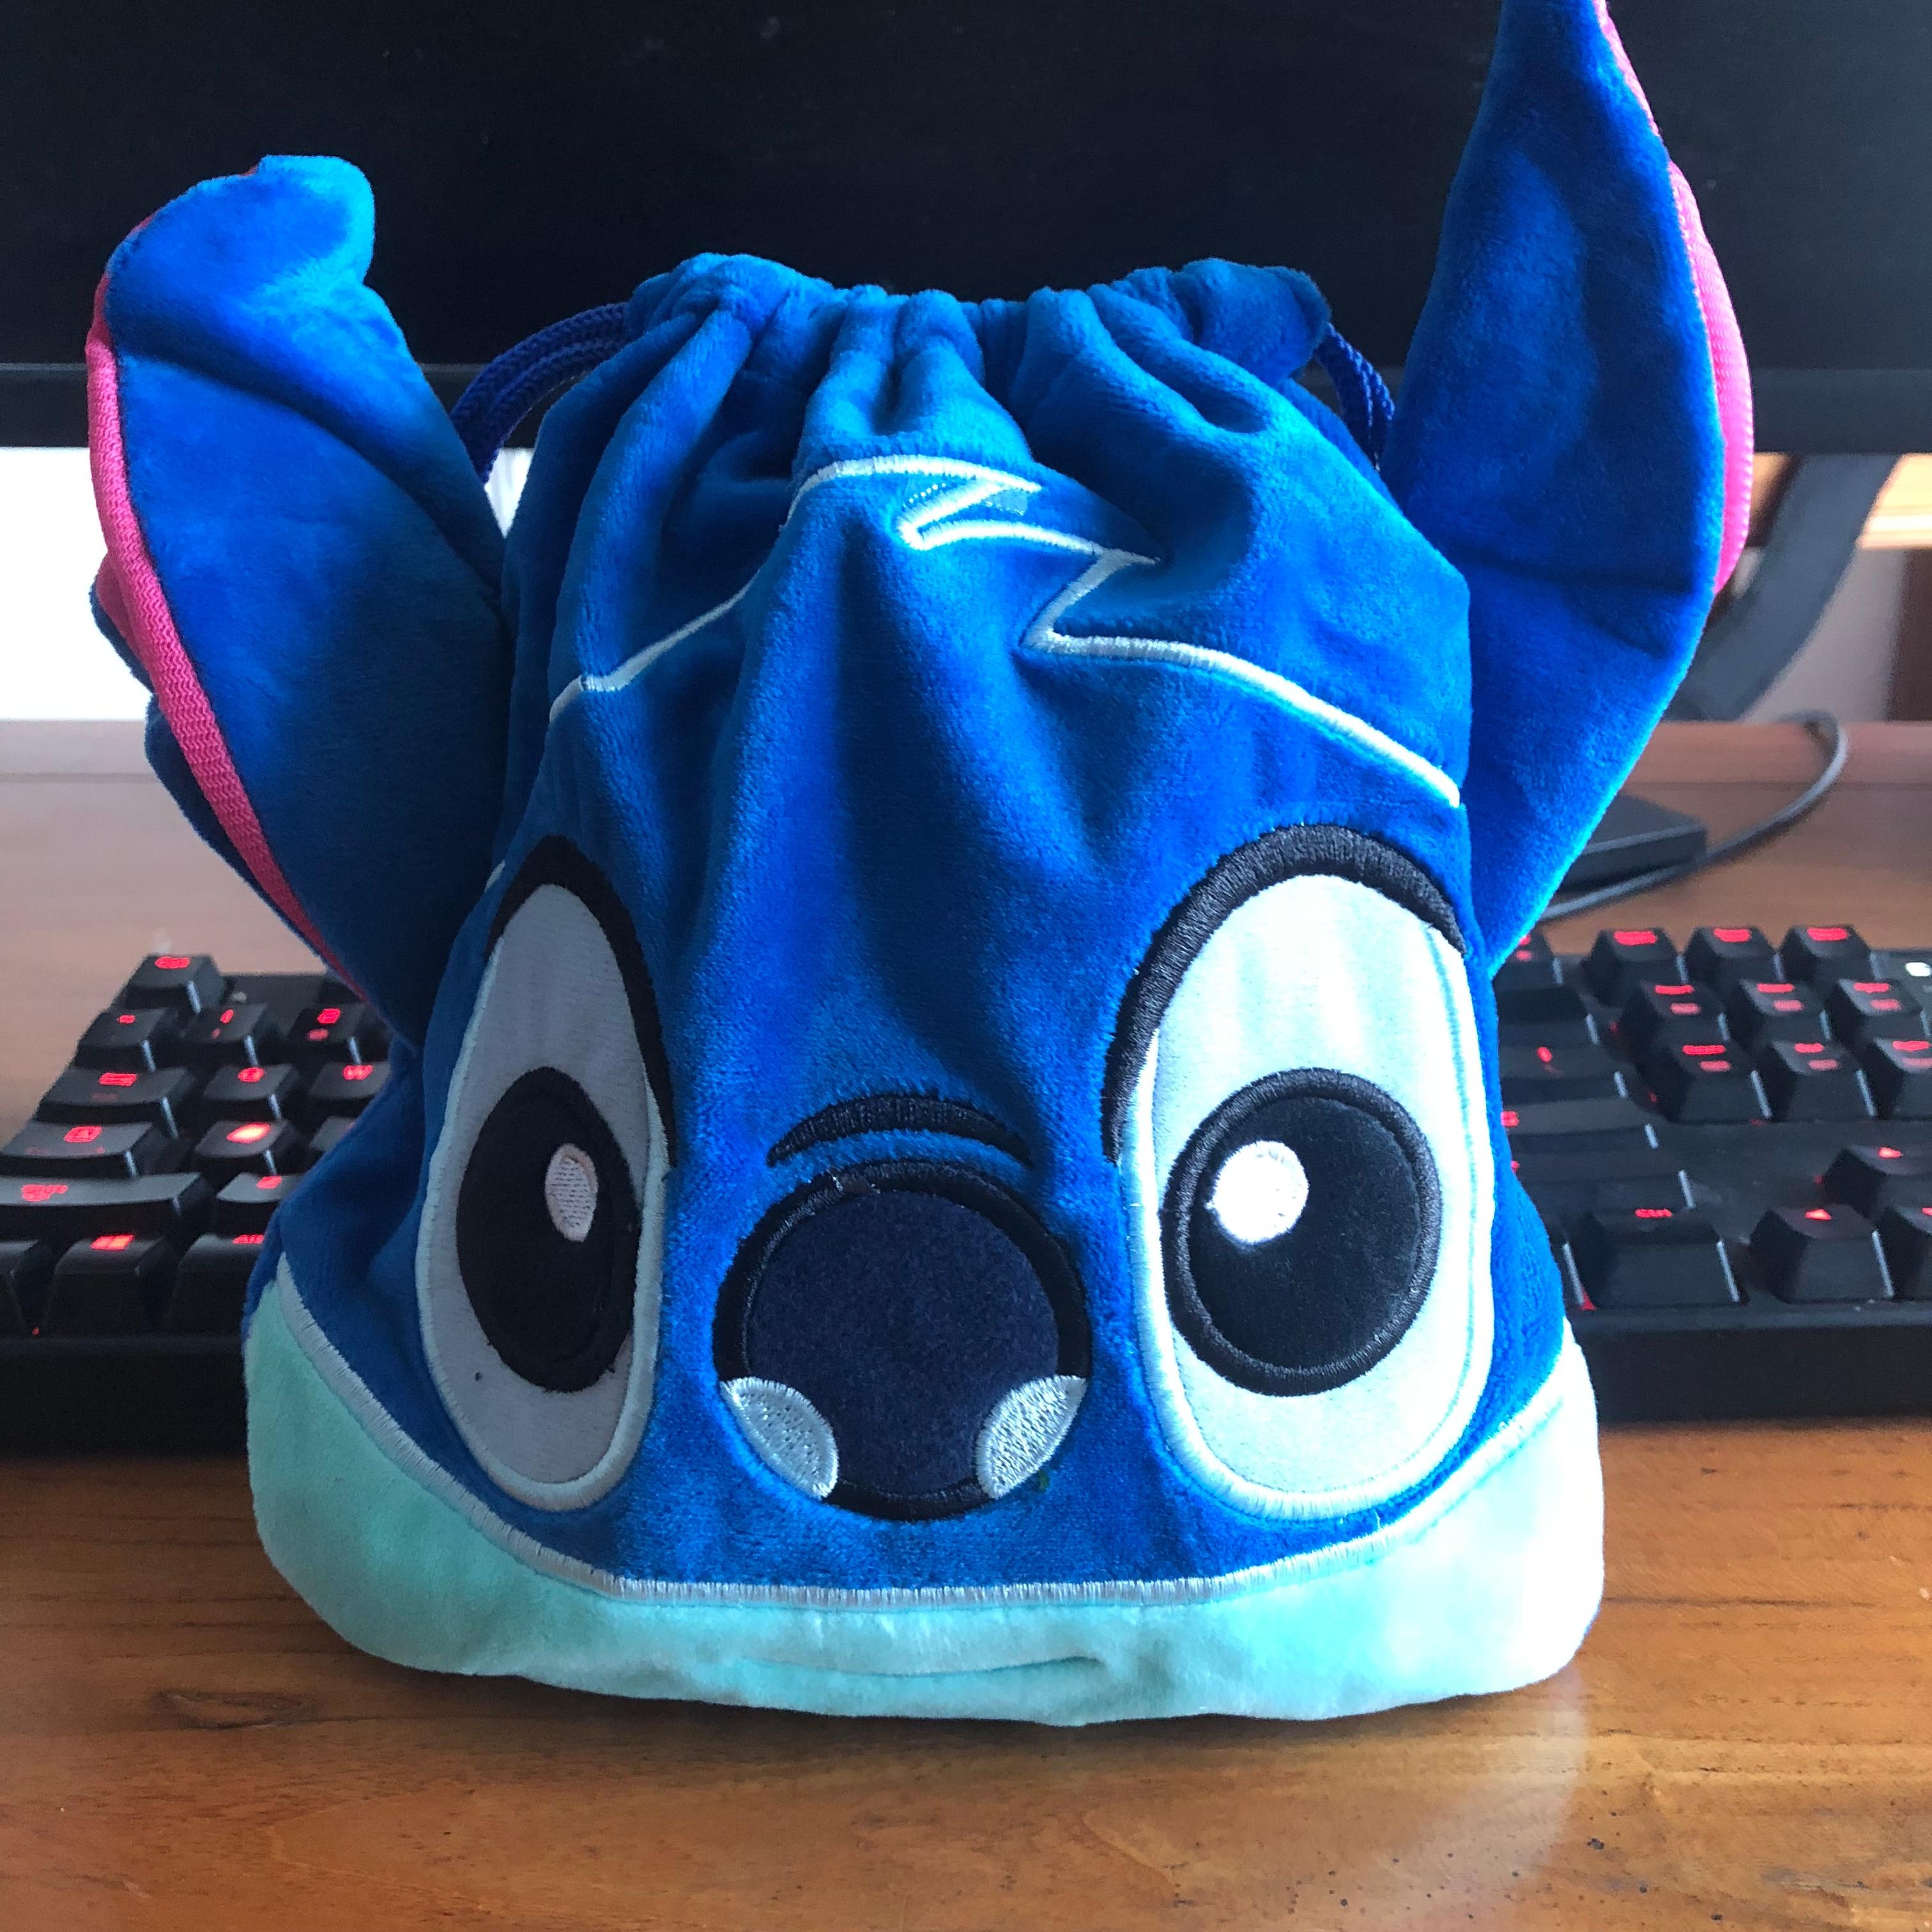 Stitch Smile Anime Drawstring Bags Plush Storage Handbags Makeup Bag Coin Purses Unisex NEW